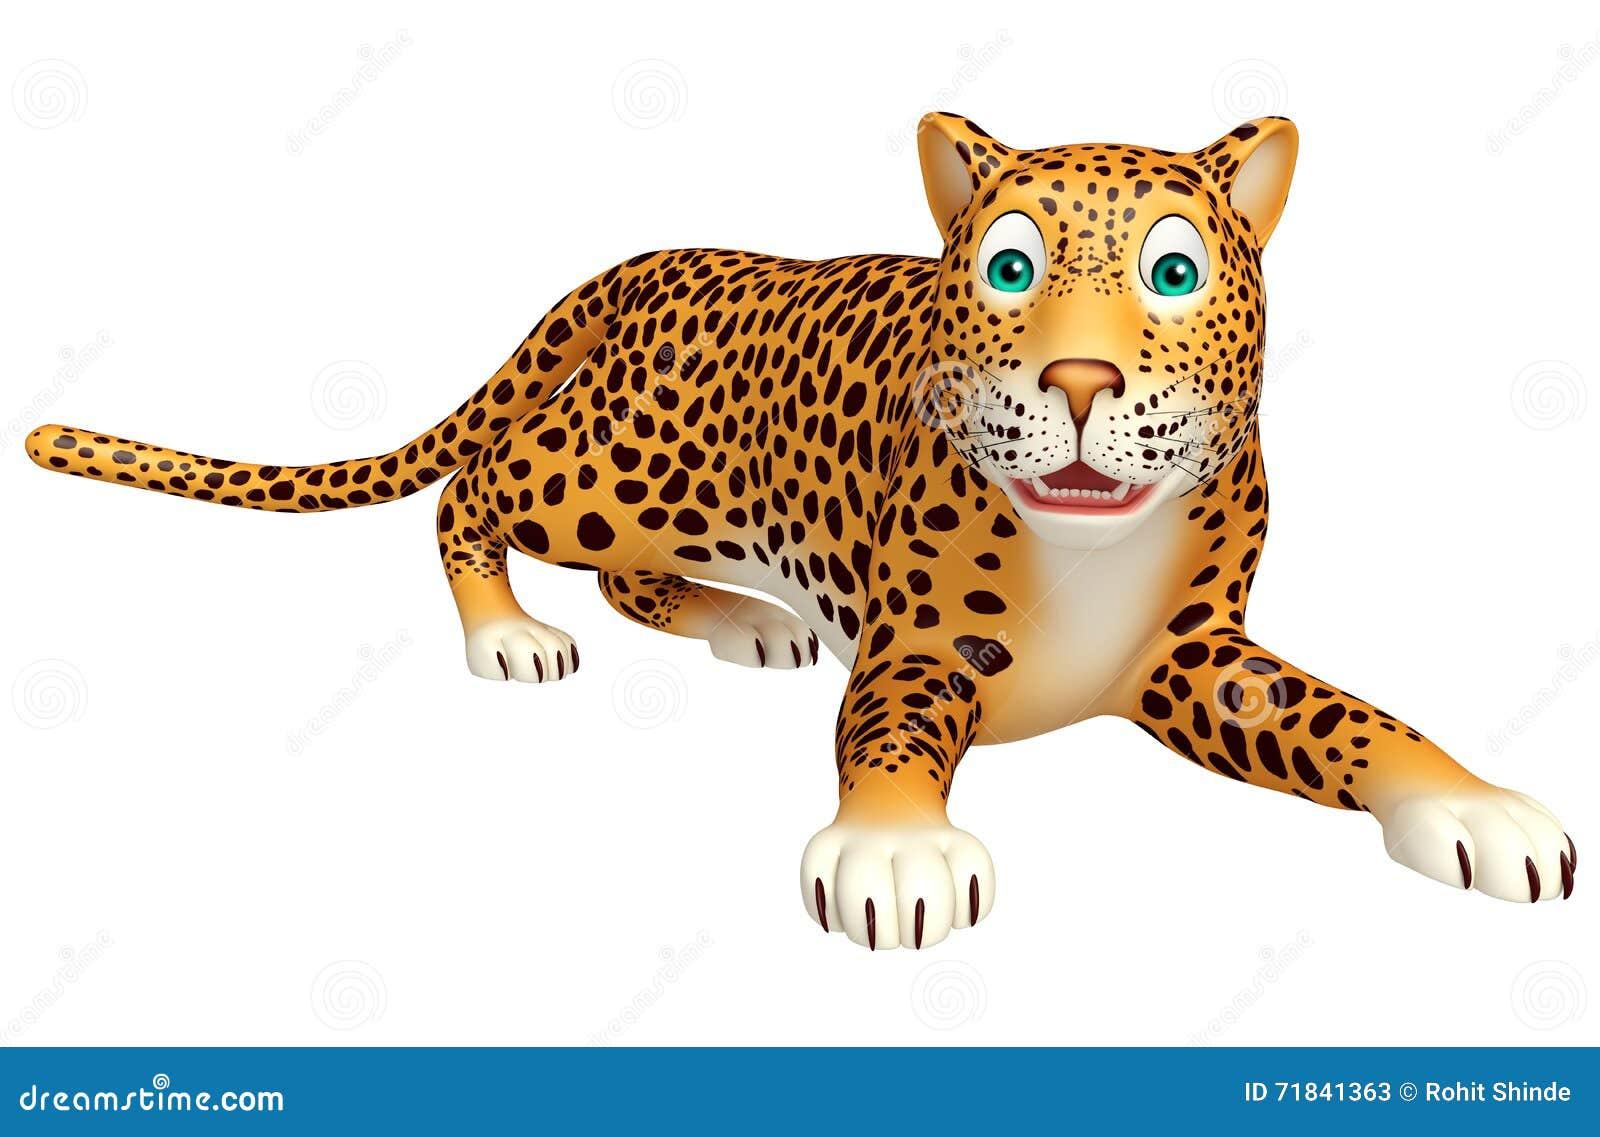 Dibujo Leopardo Para Colorear E Imprimir: Dibujos De Leopardo. Dibujos De Leopardos Para Colorear E